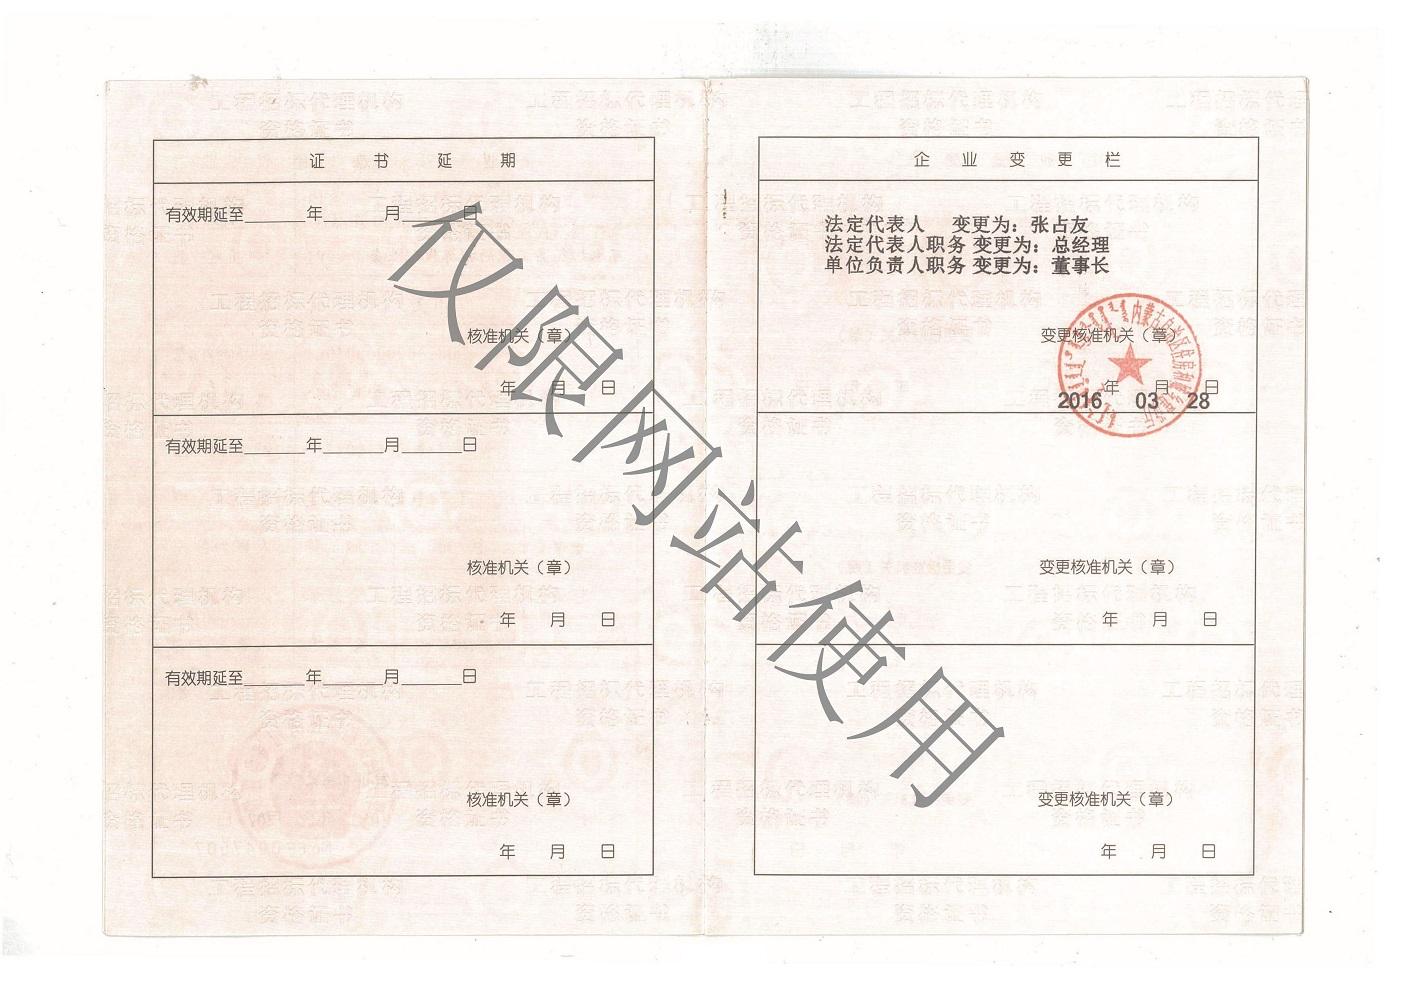 gong程88娱乐2官wang代li紌hun陡北?